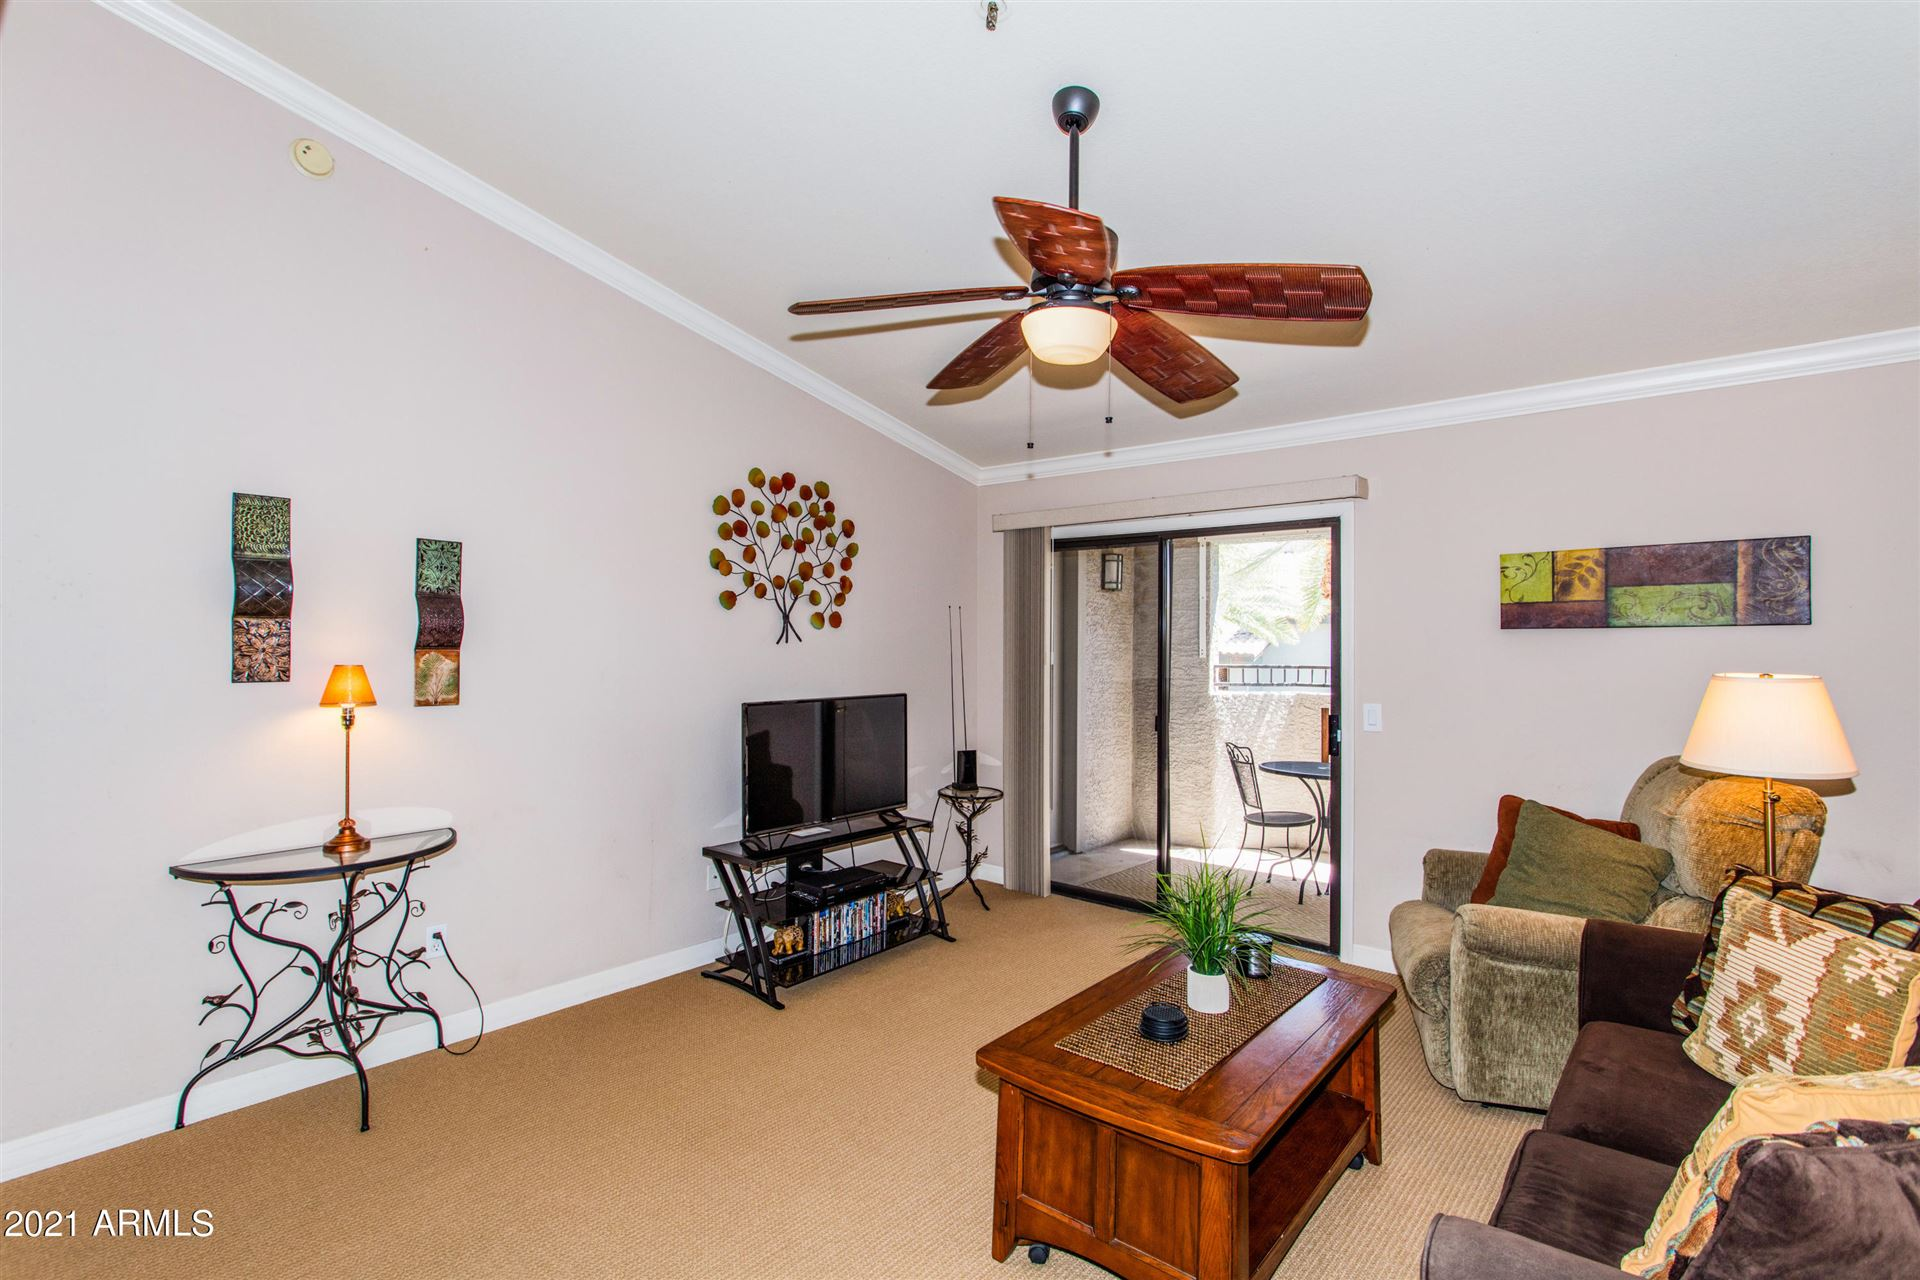 Photo of 2025 E CAMPBELL Avenue #301, Phoenix, AZ 85016 (MLS # 6232198)